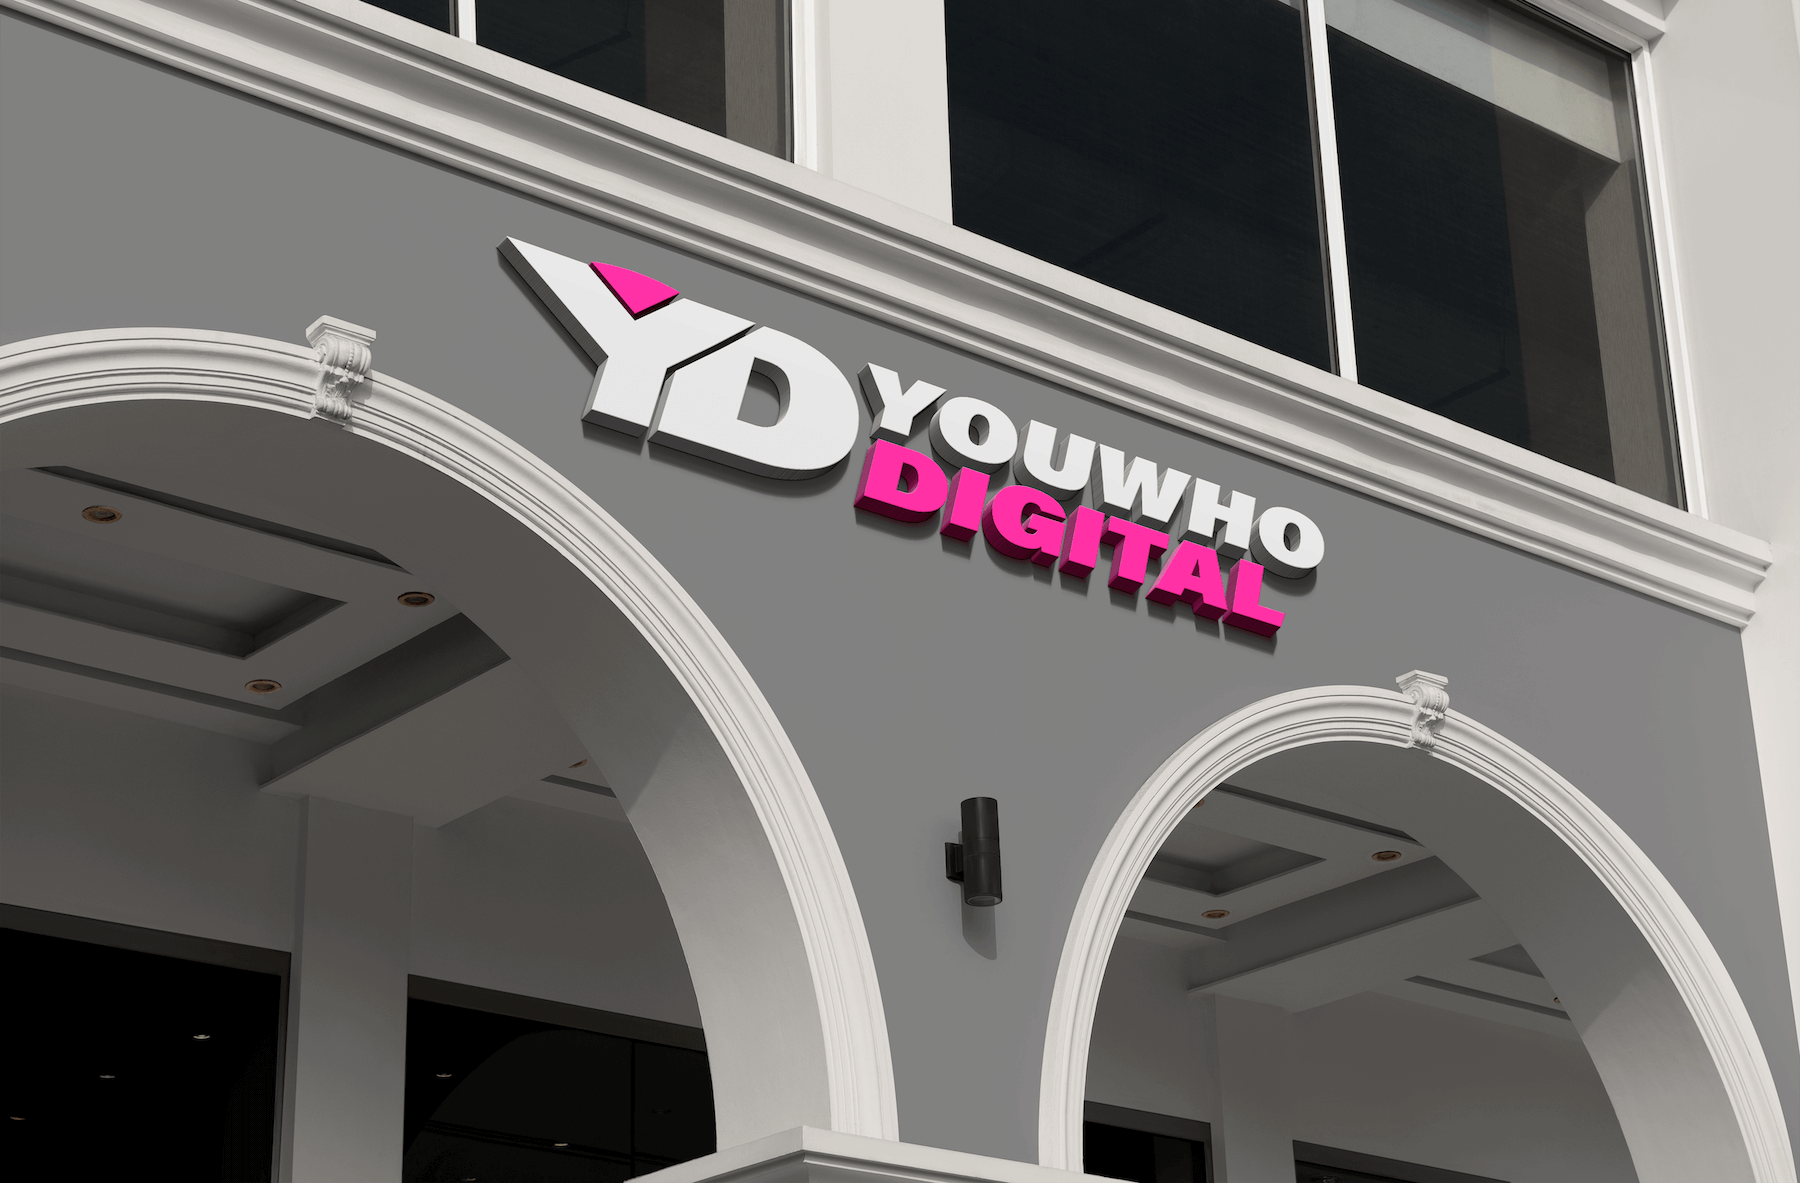 YouWho Digital Careers